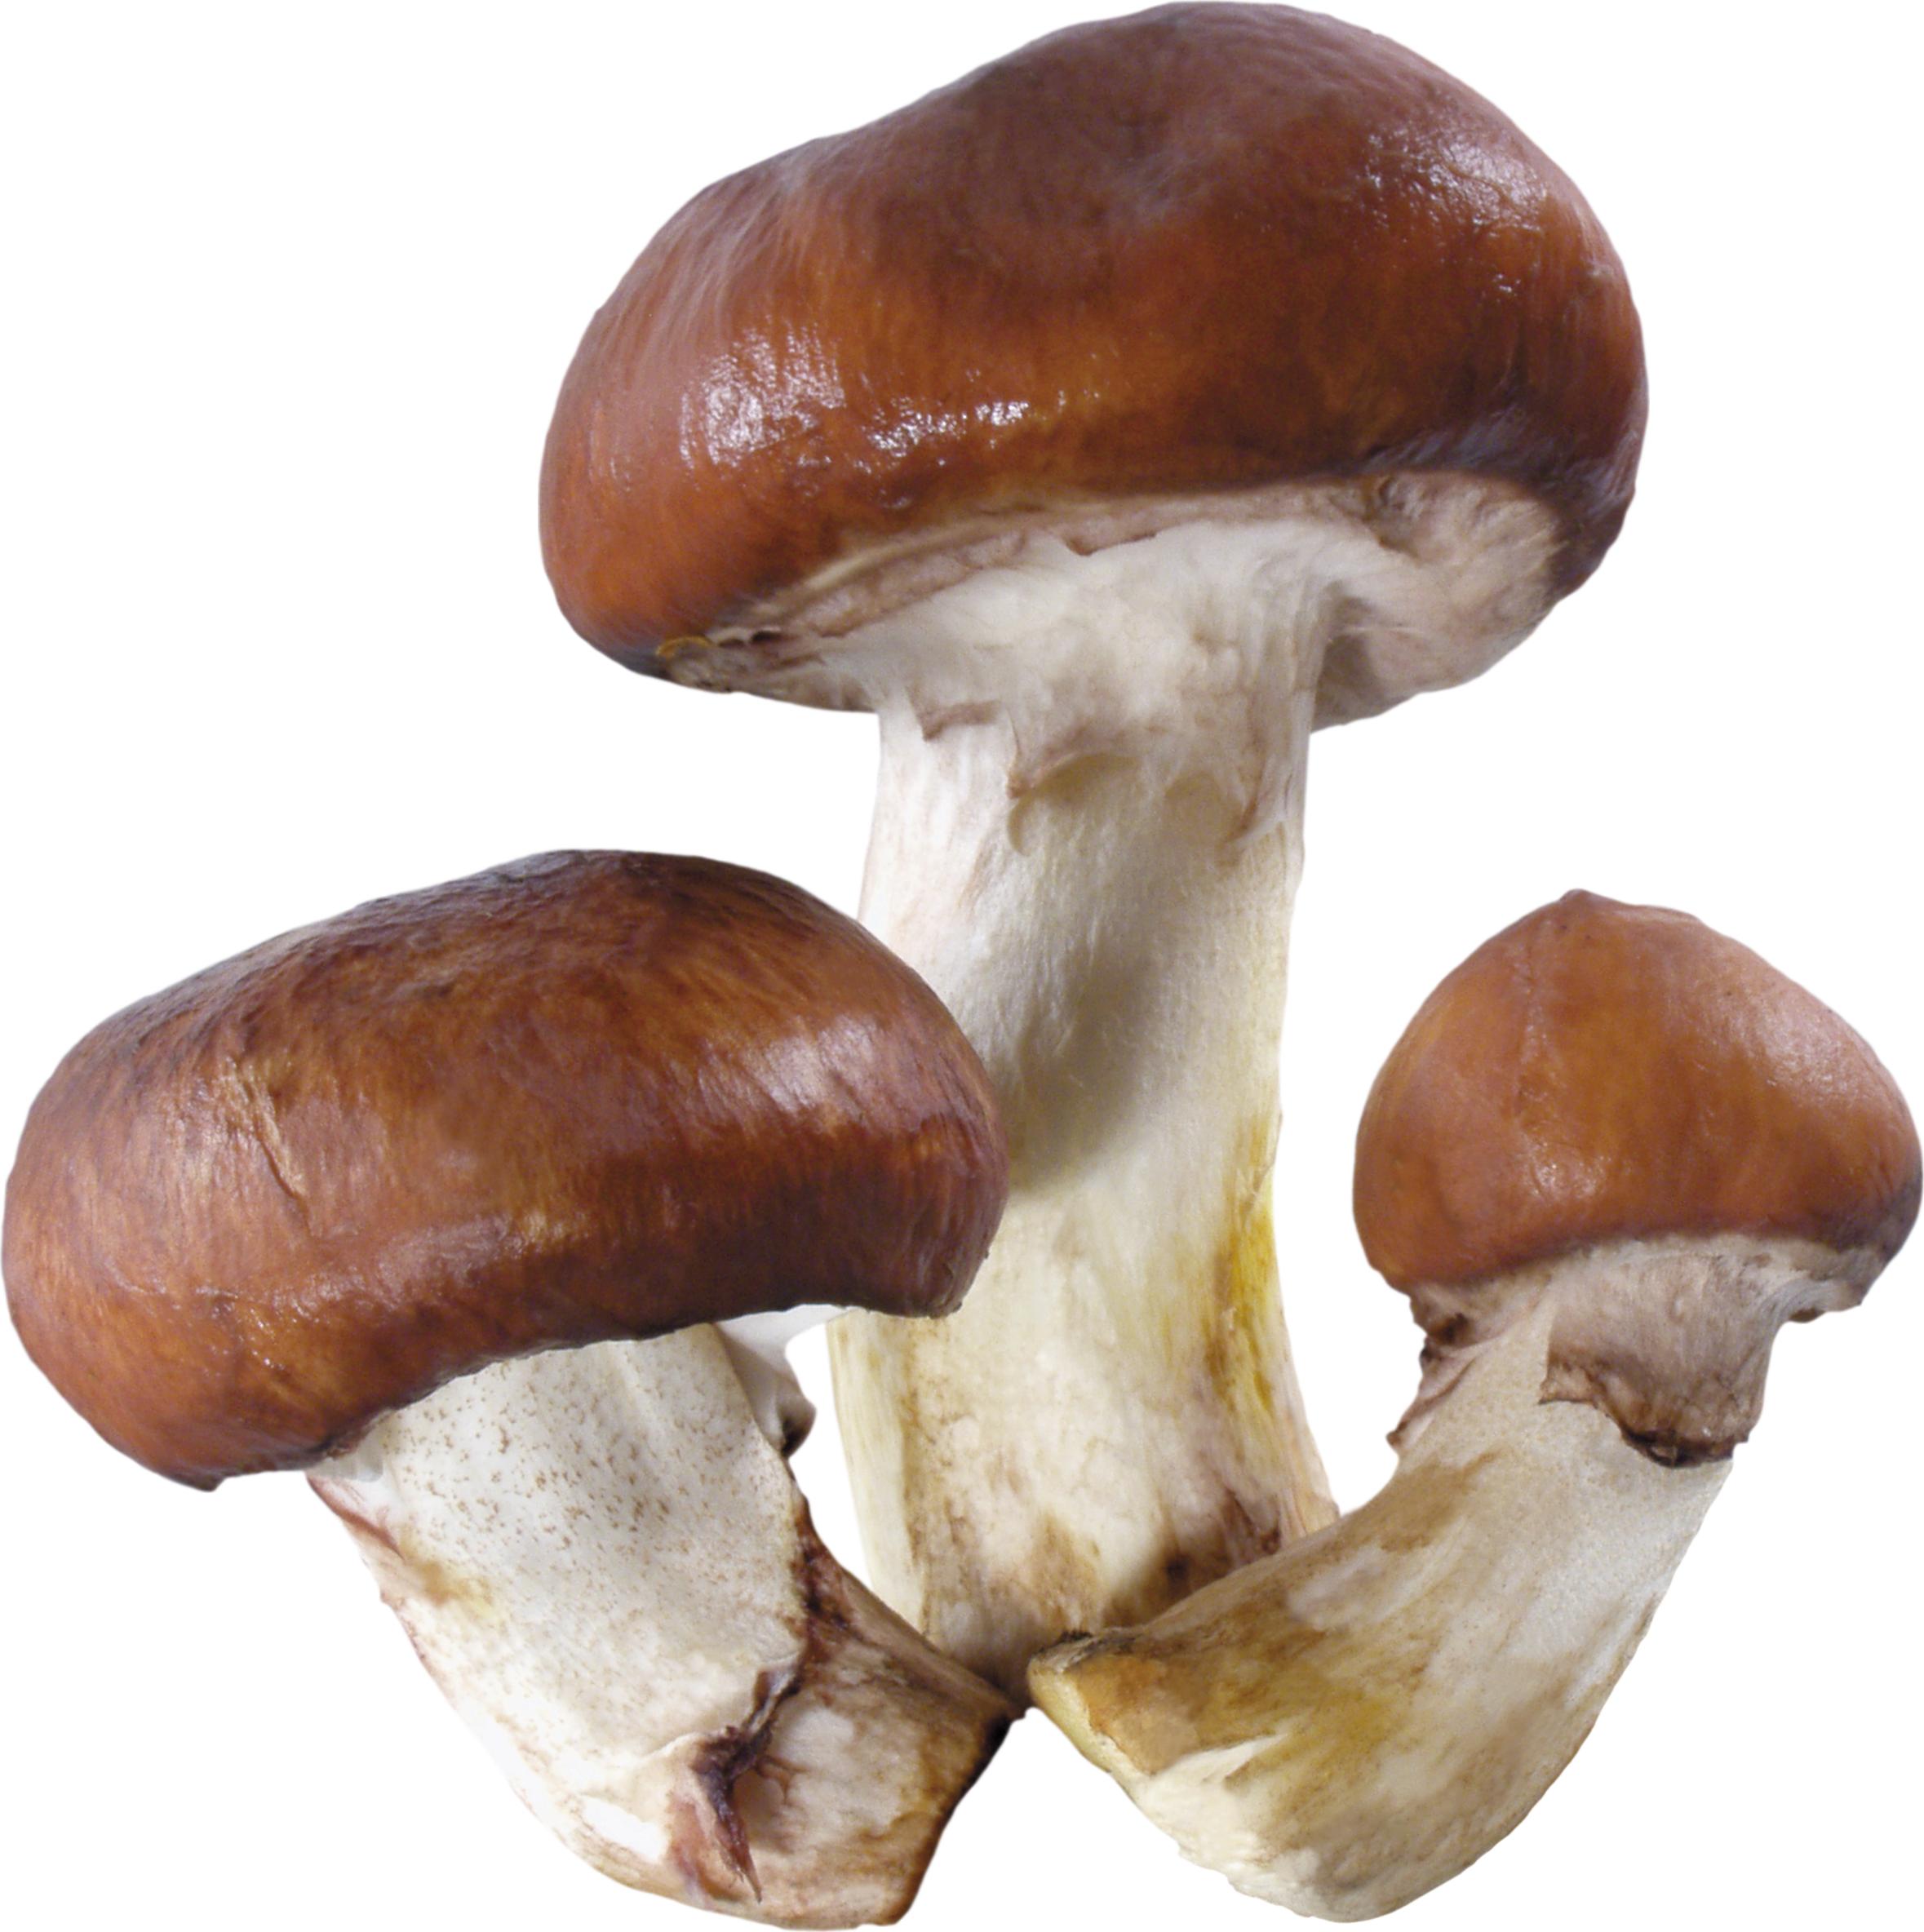 Mushroom clipart edible mushroom. Png image purepng free